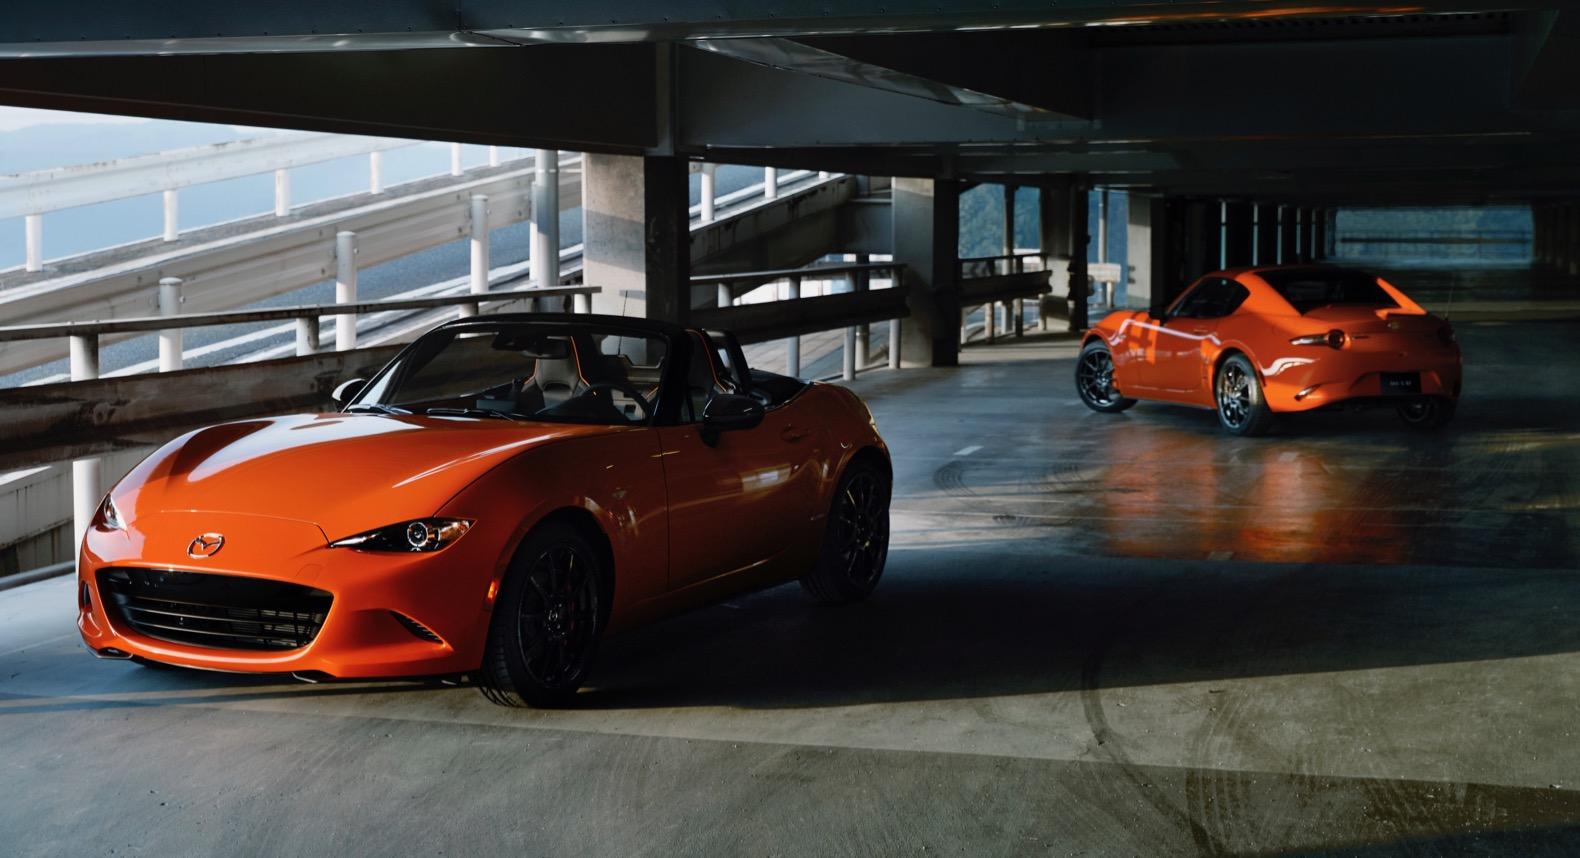 2019 mazda mx 5 miata 30th anniversary edition arrives in racing orange the torque report. Black Bedroom Furniture Sets. Home Design Ideas